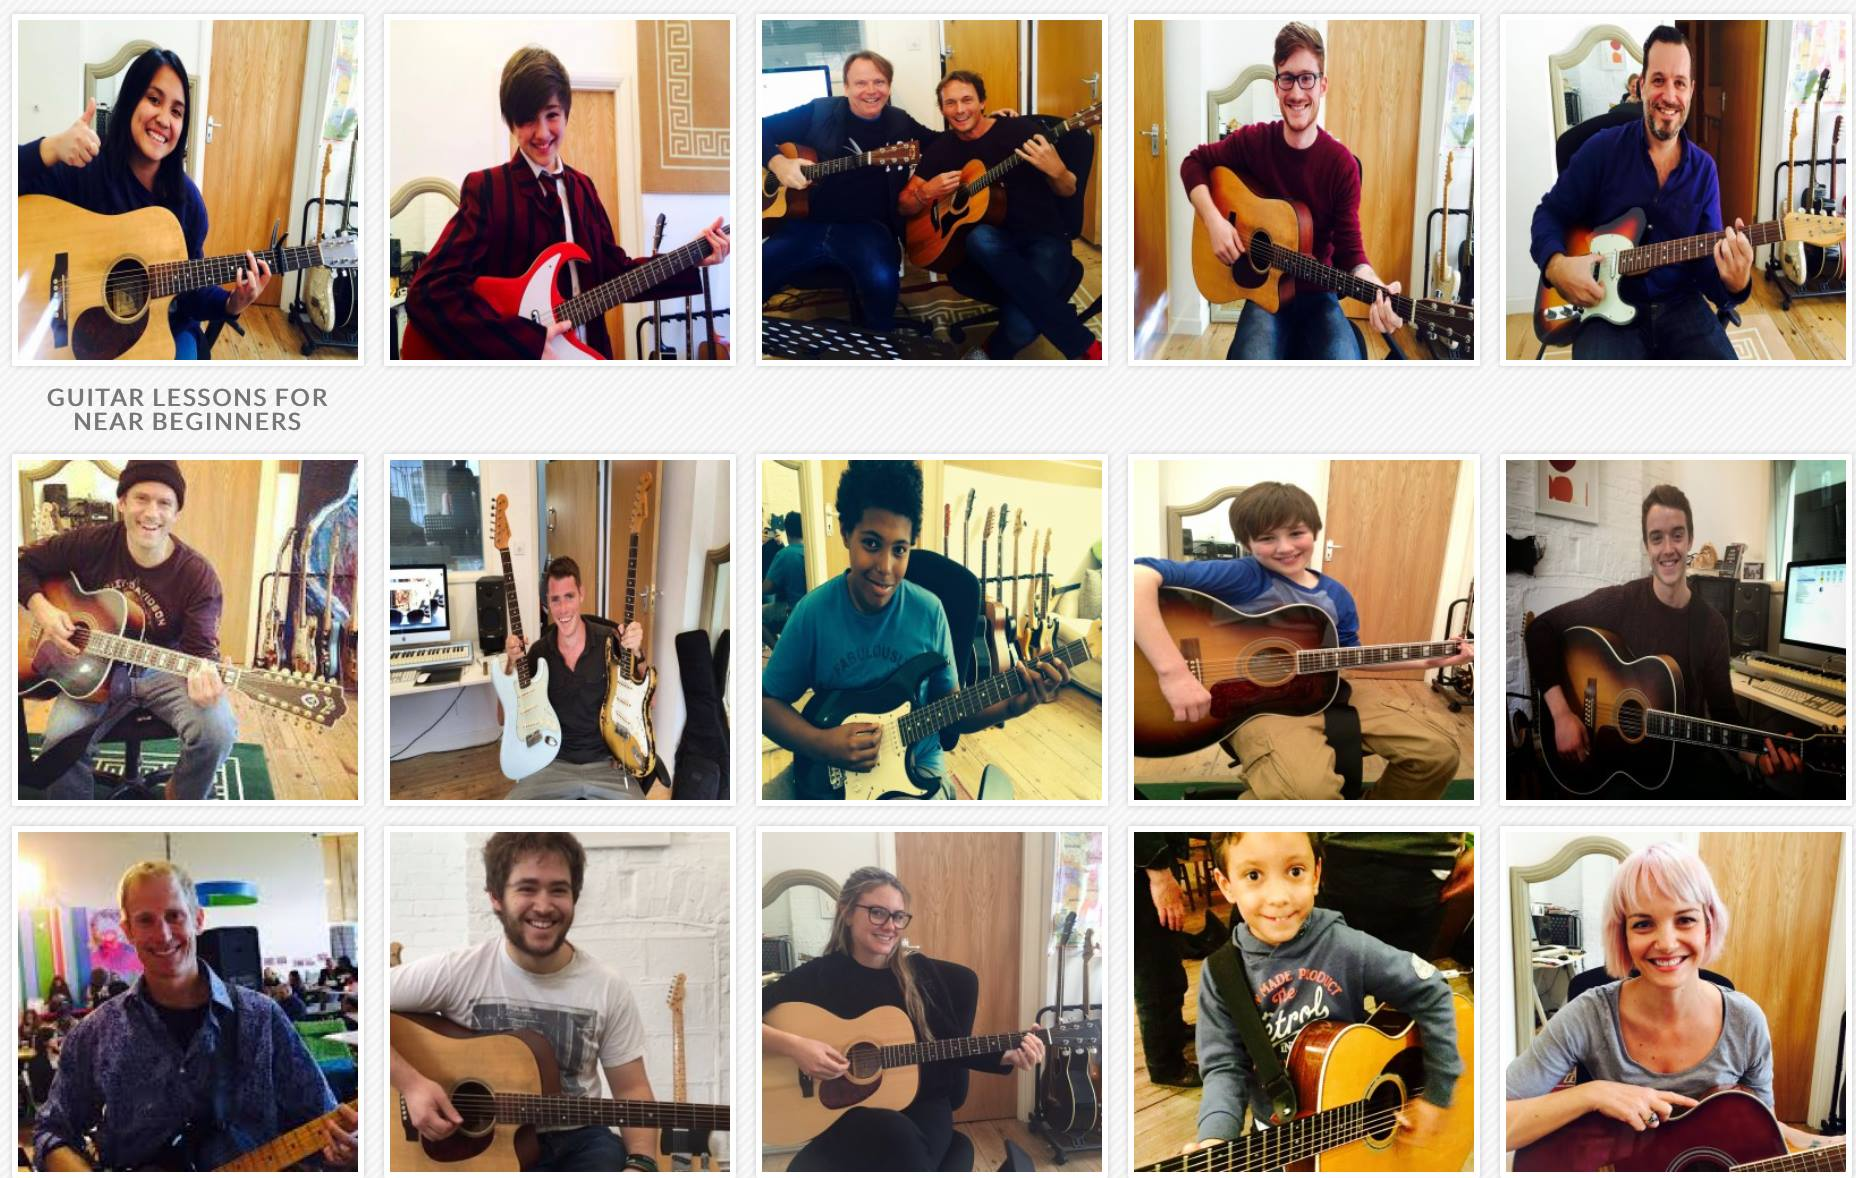 Guitar Lessons Hanover Hollingbury Hollingdean Brighton